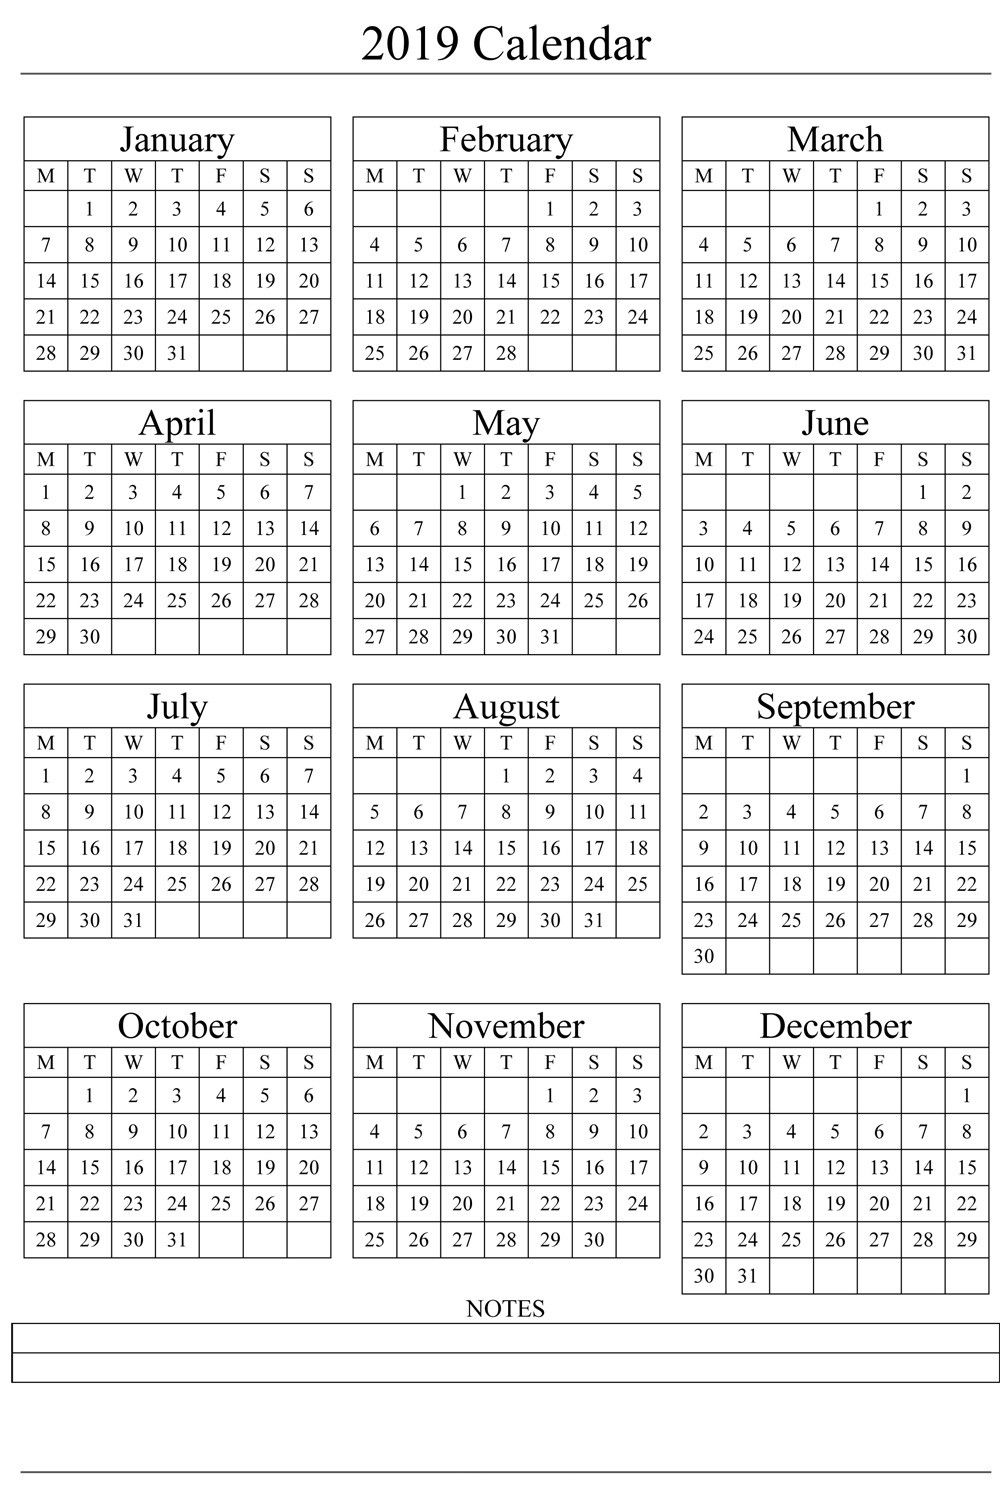 2019 Printable Calendar Templates [Free]